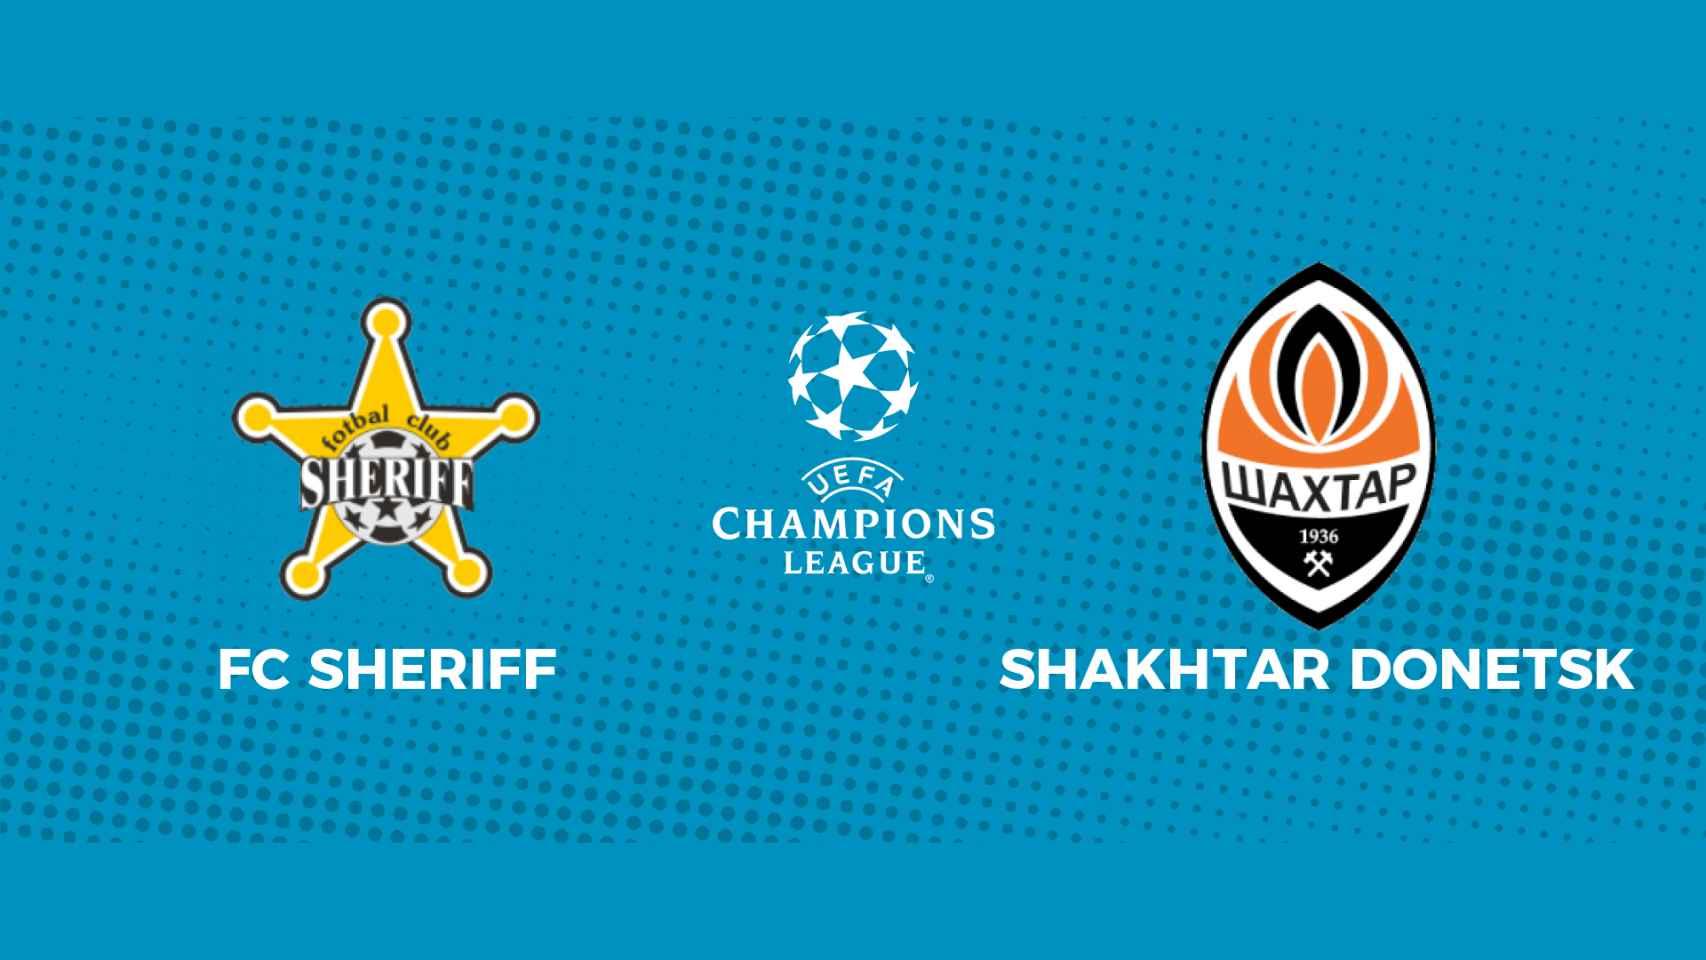 FC Sheriff - Shakhtar Donetsk: siga en directo el partido de la Champions League